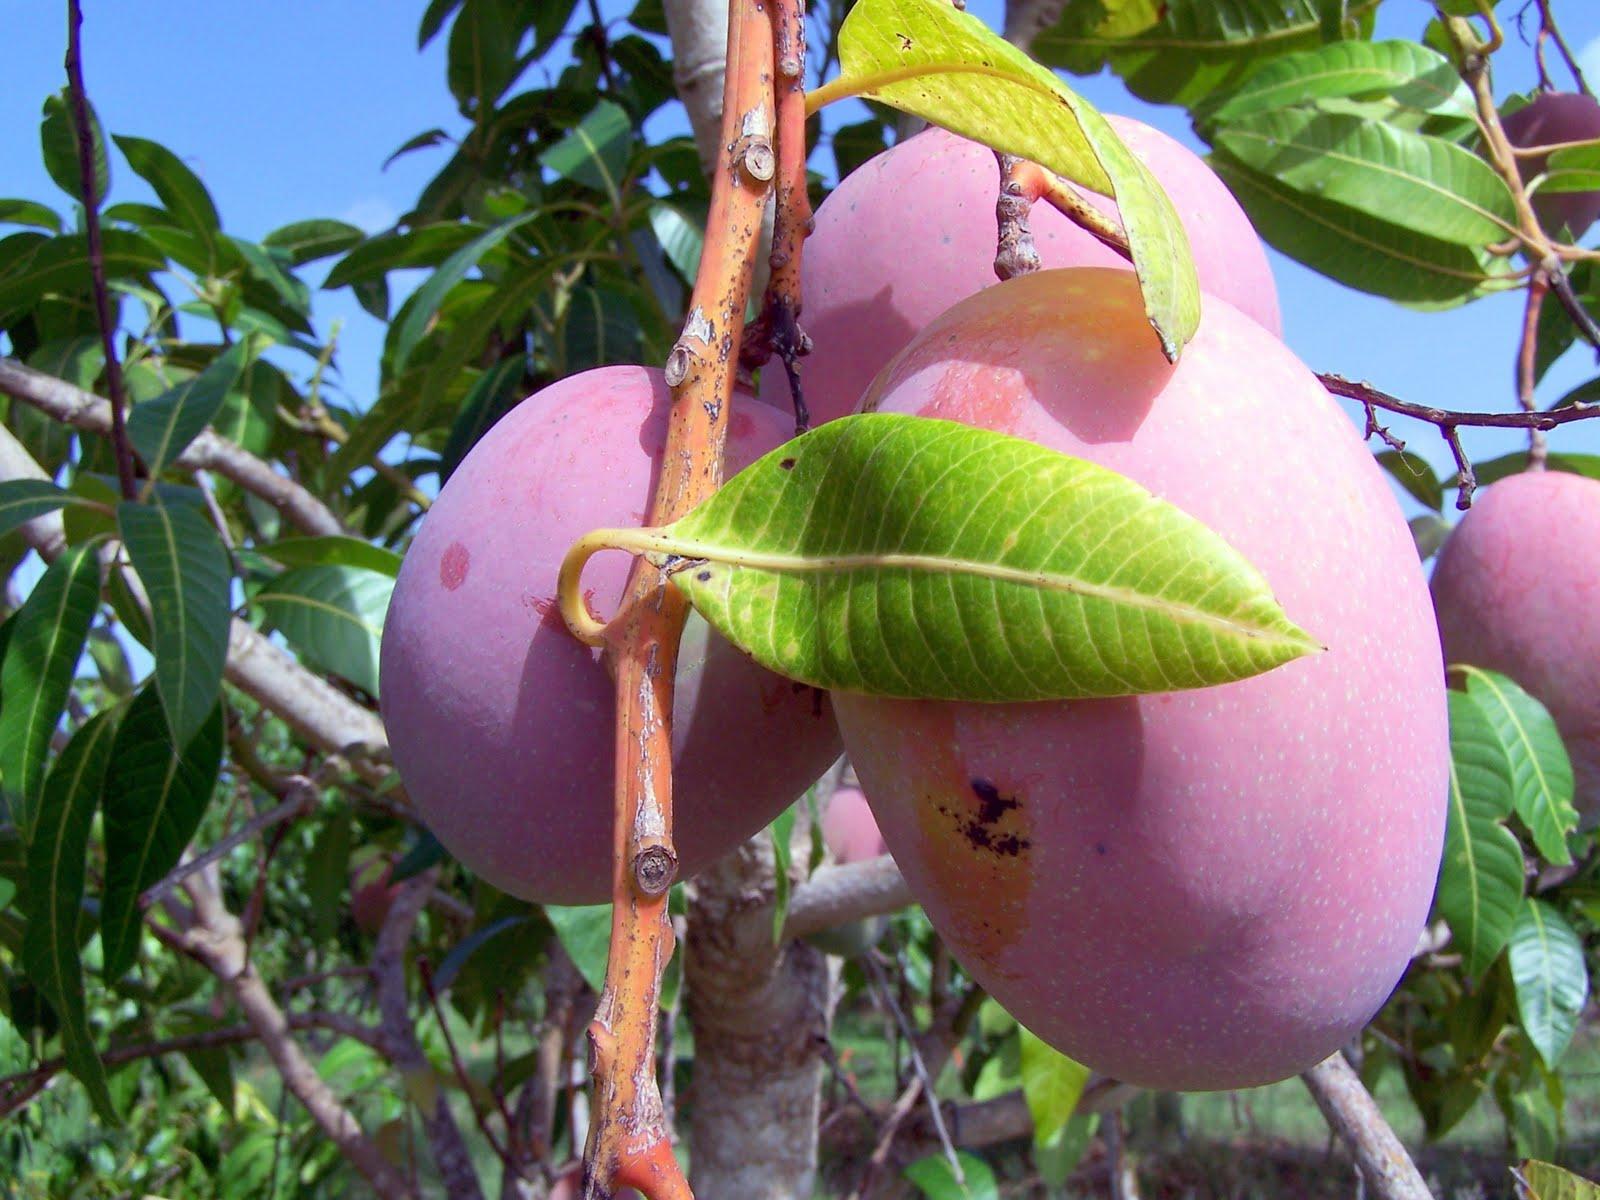 Pine Island, Florida: Summer Rains Ripen Tropical Fruit On